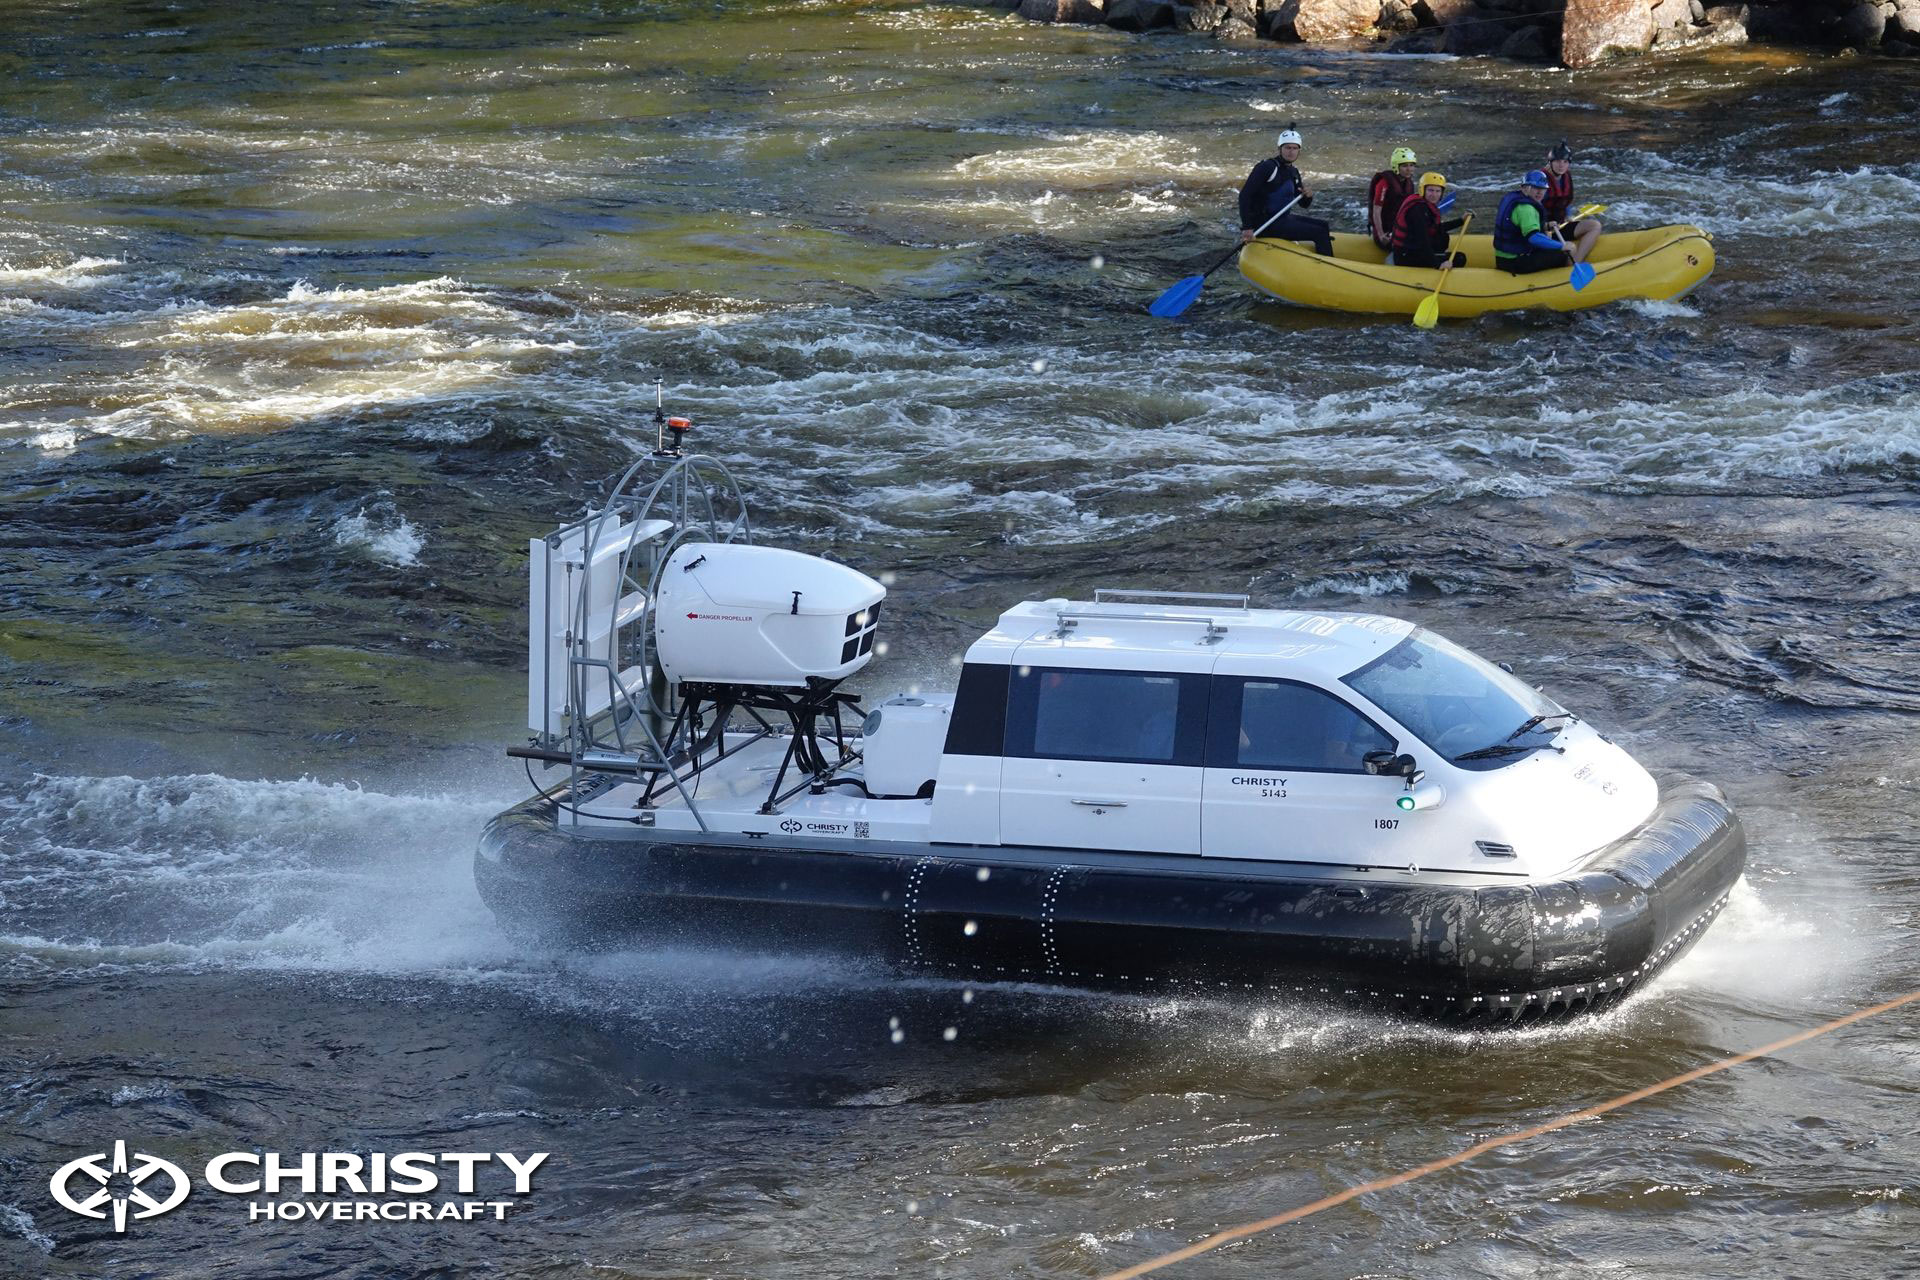 Hovercraft-Christy-5146-FC-08.jpg | фото №8